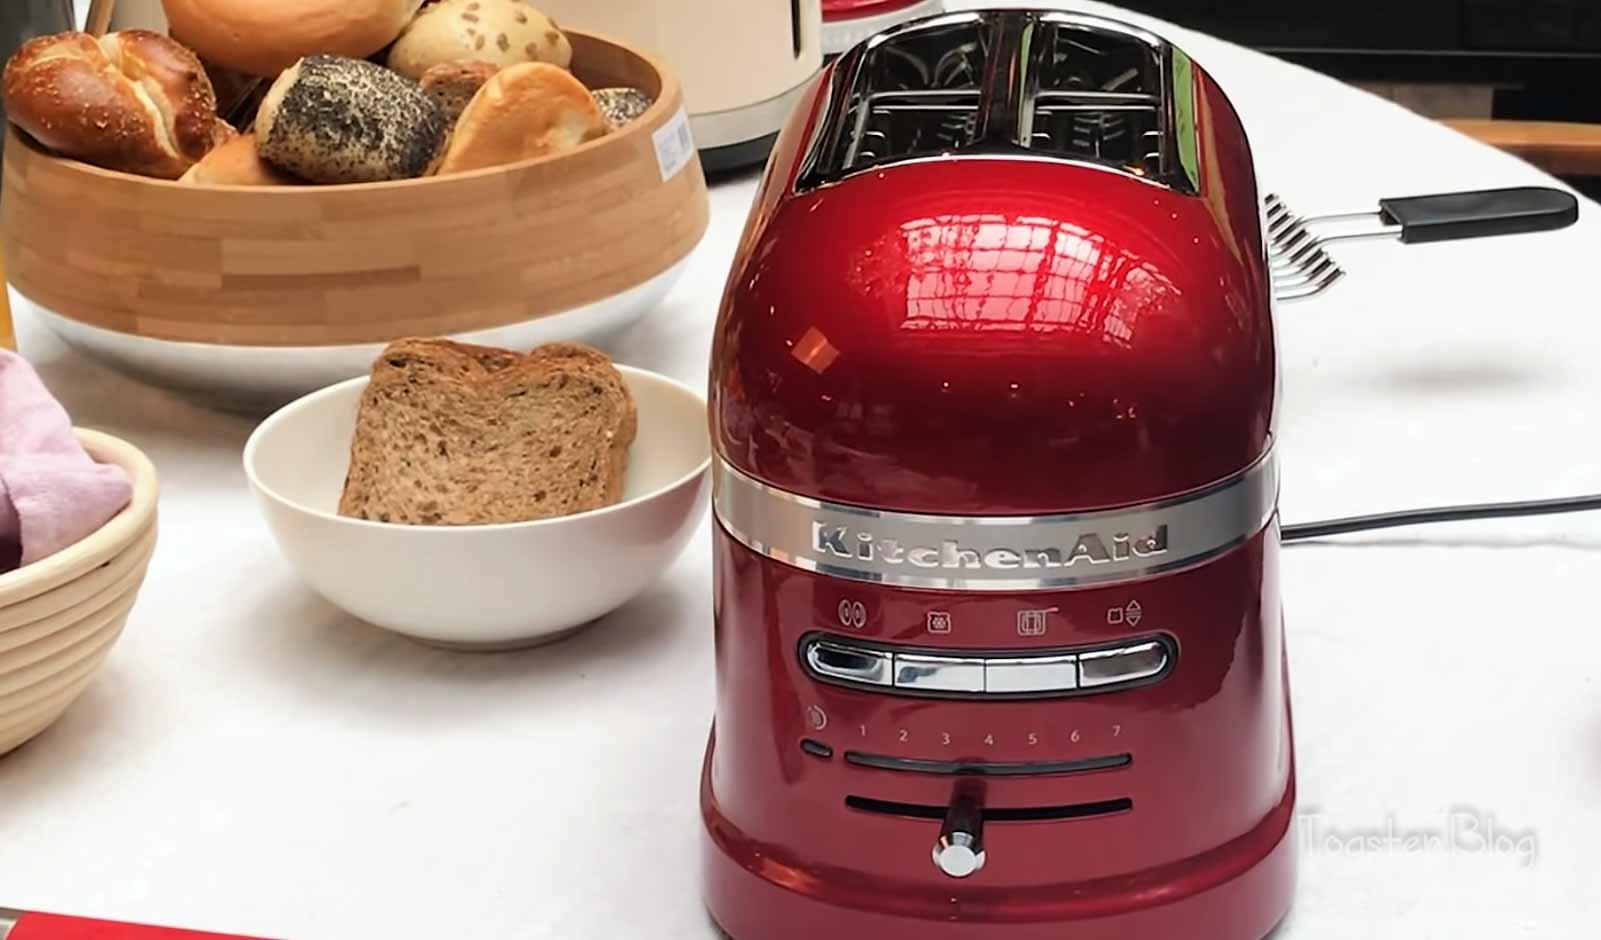 Best red retro toaster